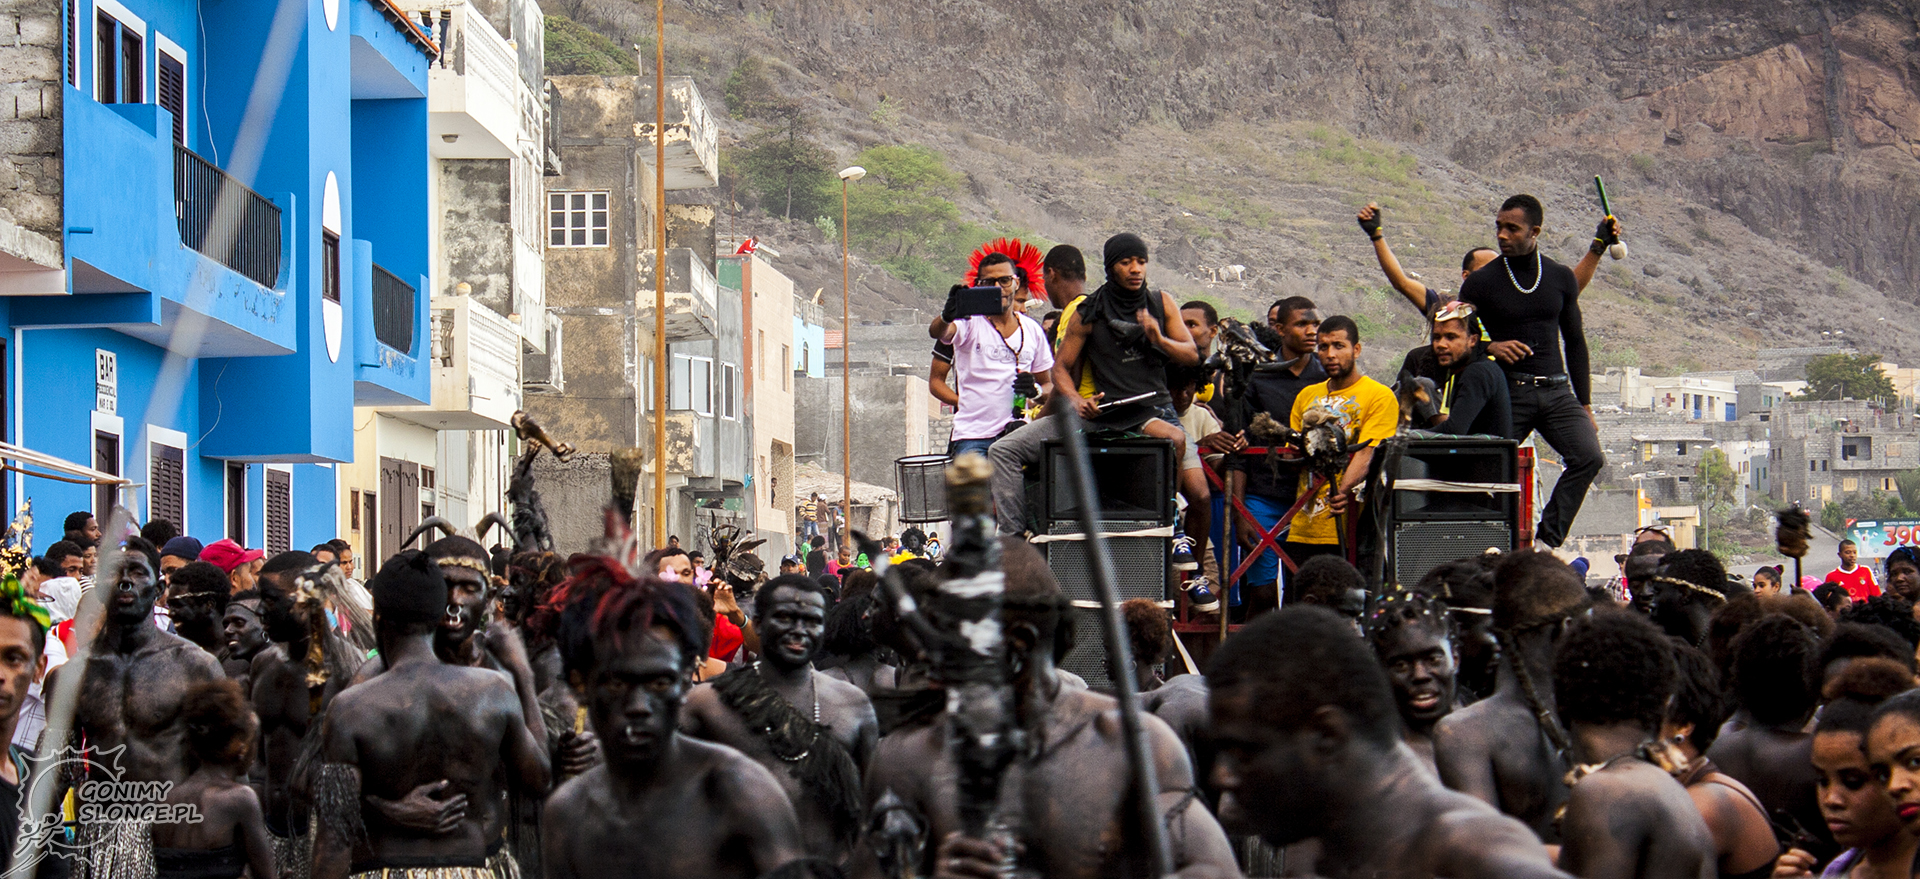 Mandingas - karnawał na Cabo Verde, Santo Antao